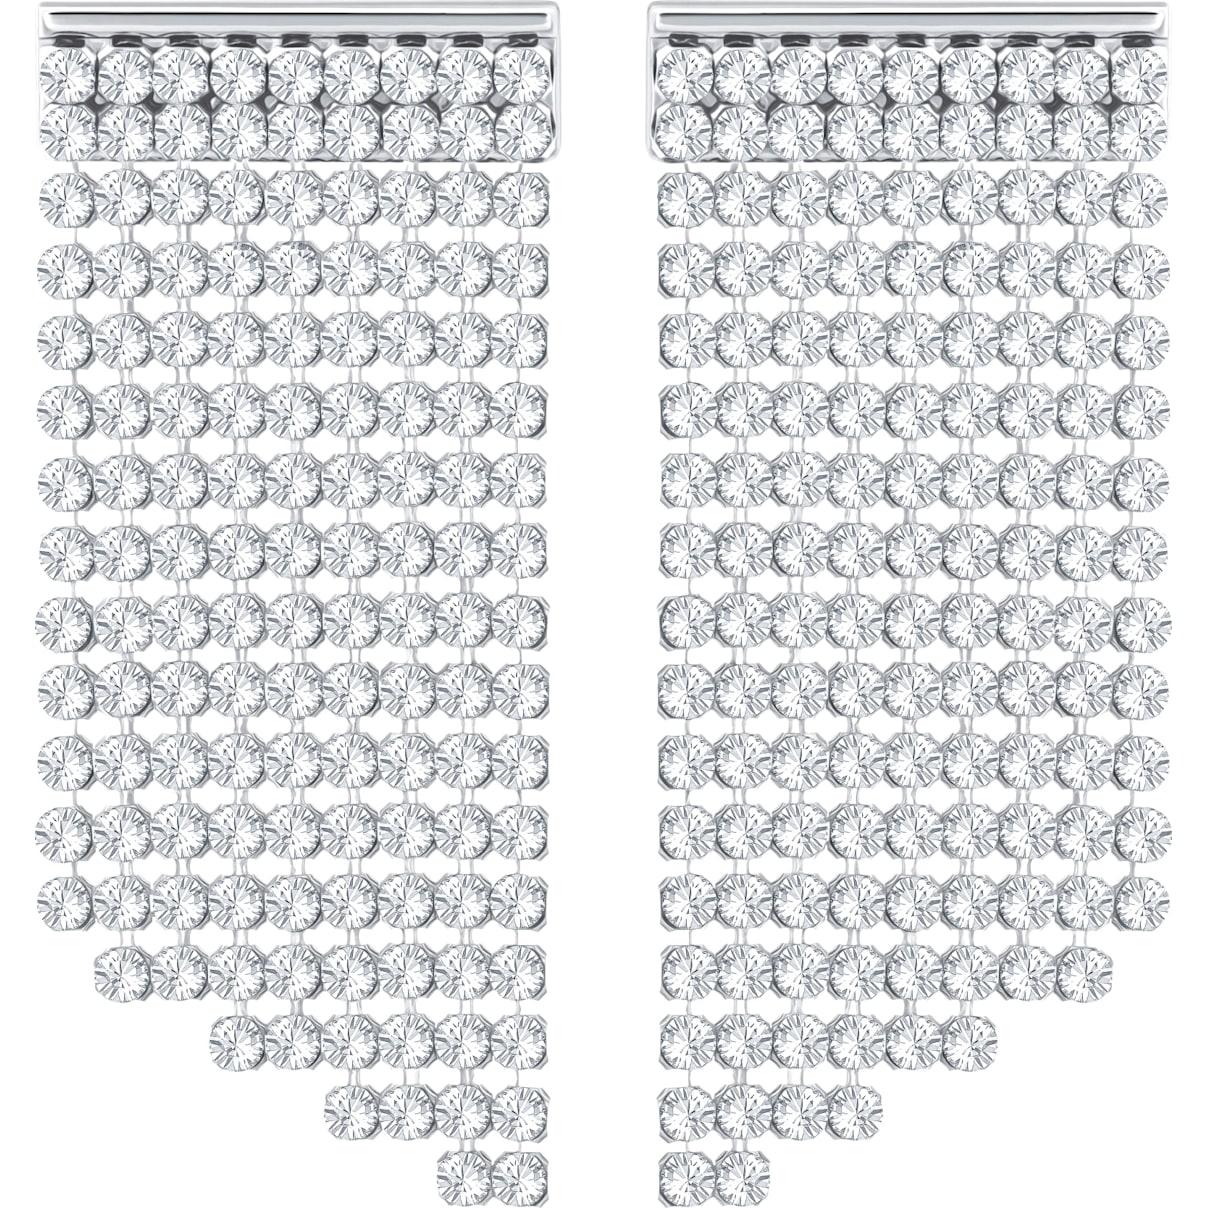 Swarovski Fit Pierced Earrings, White, Palladium plated